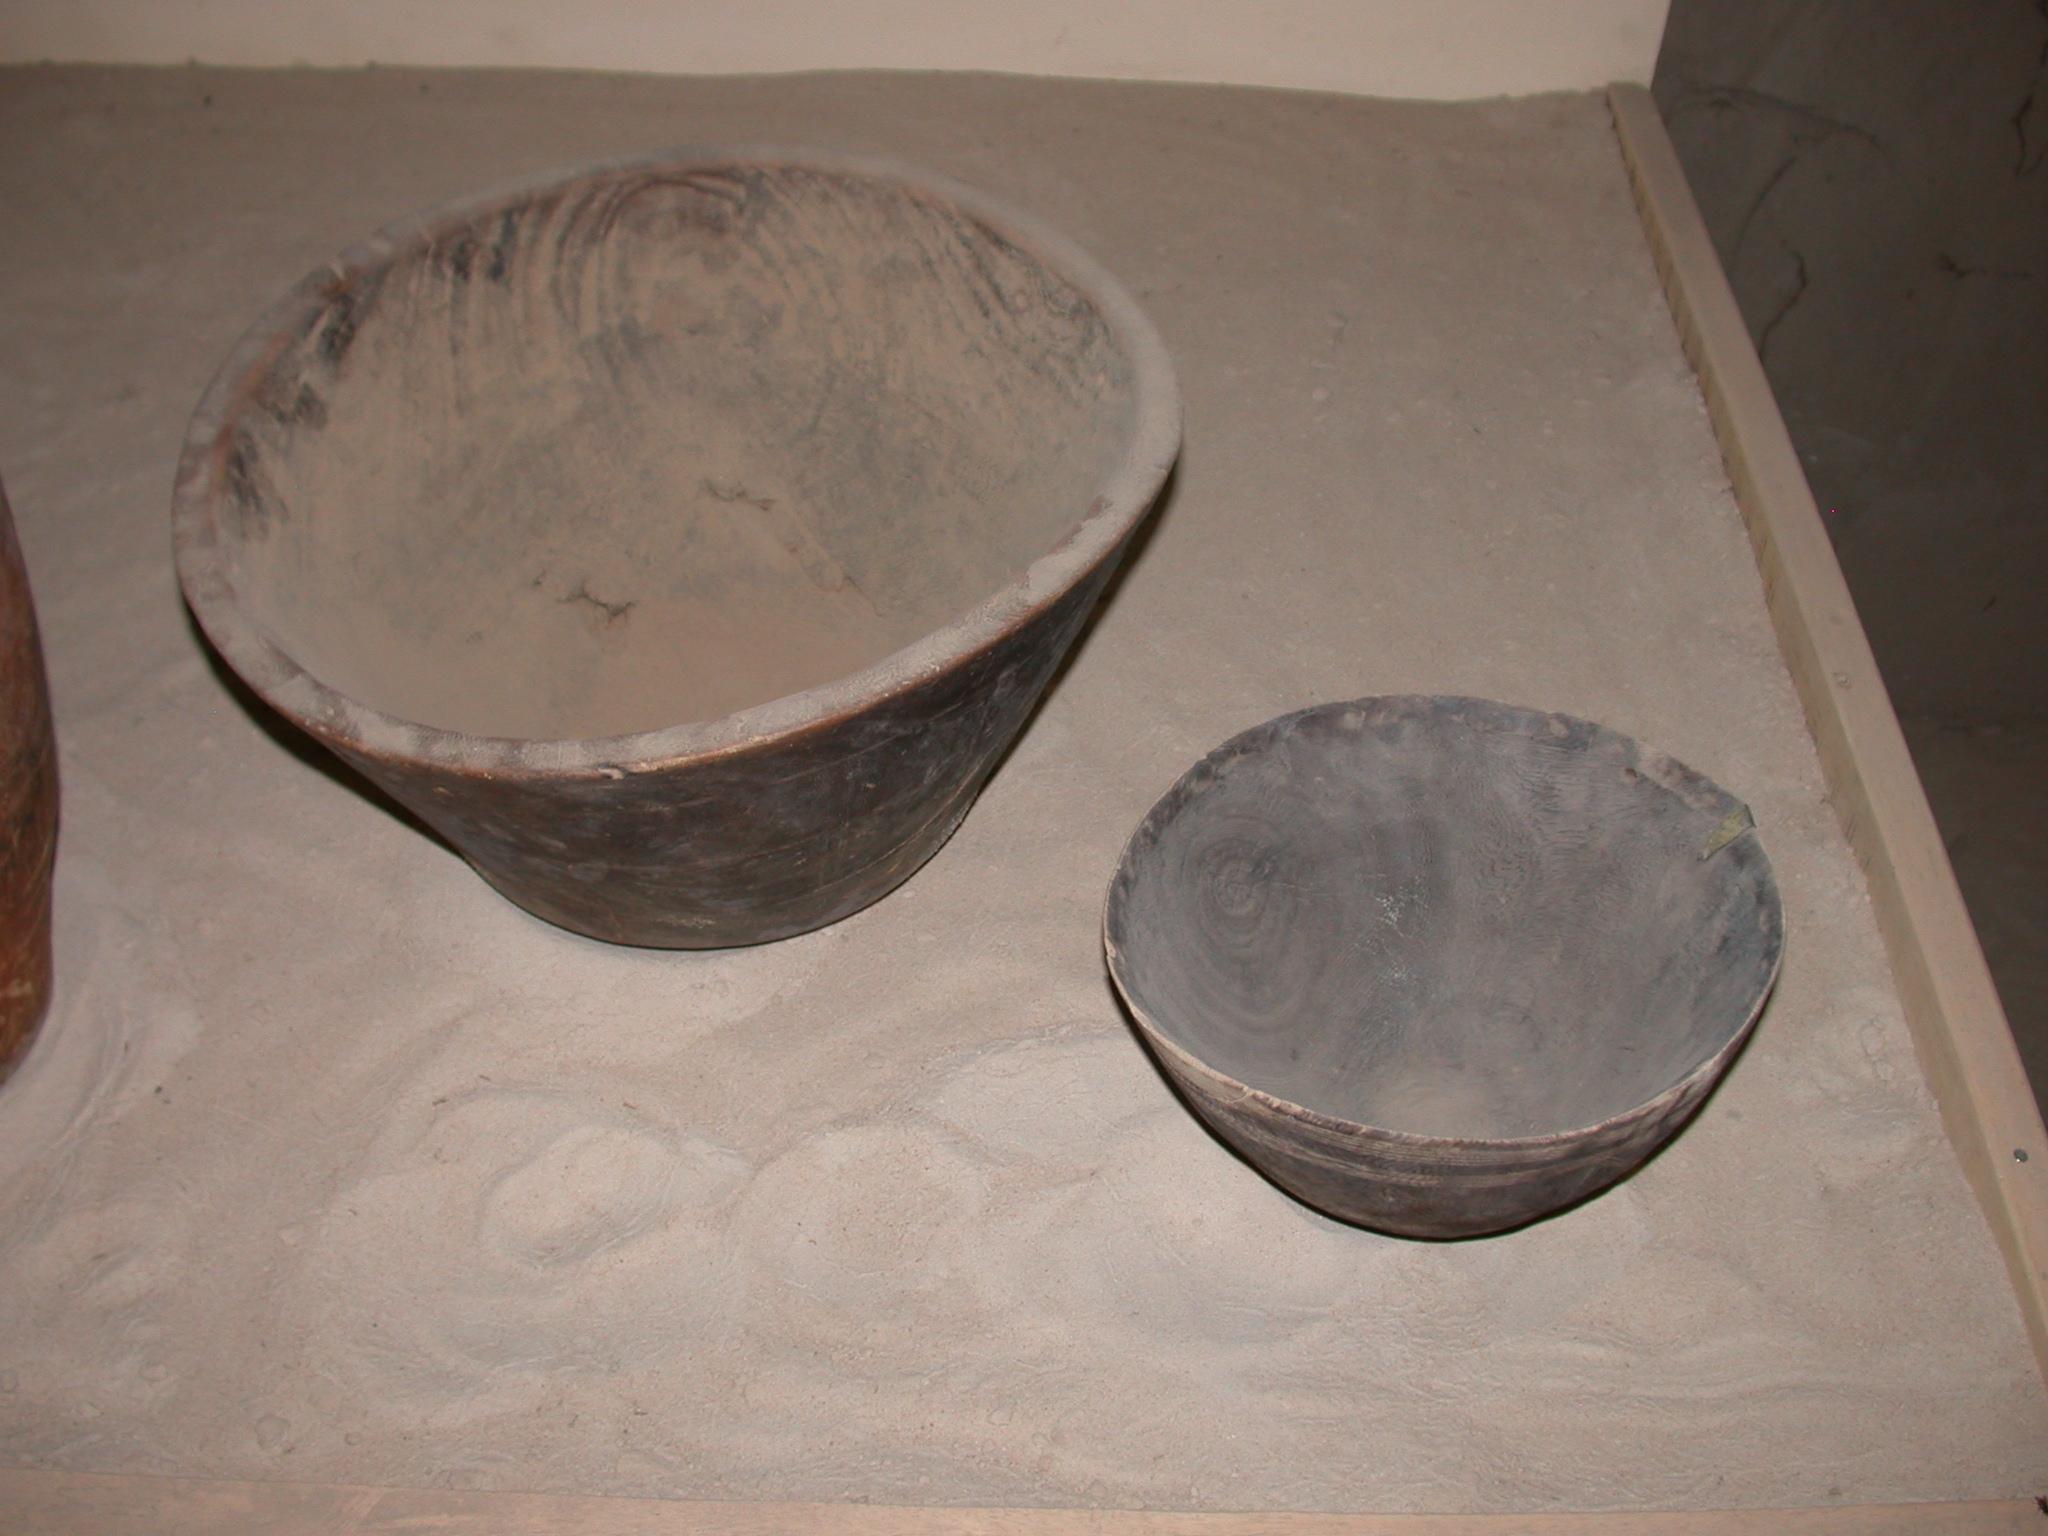 Wooden Bowls, Timbuktu Ethnological Museum, Timbuktu, Mali